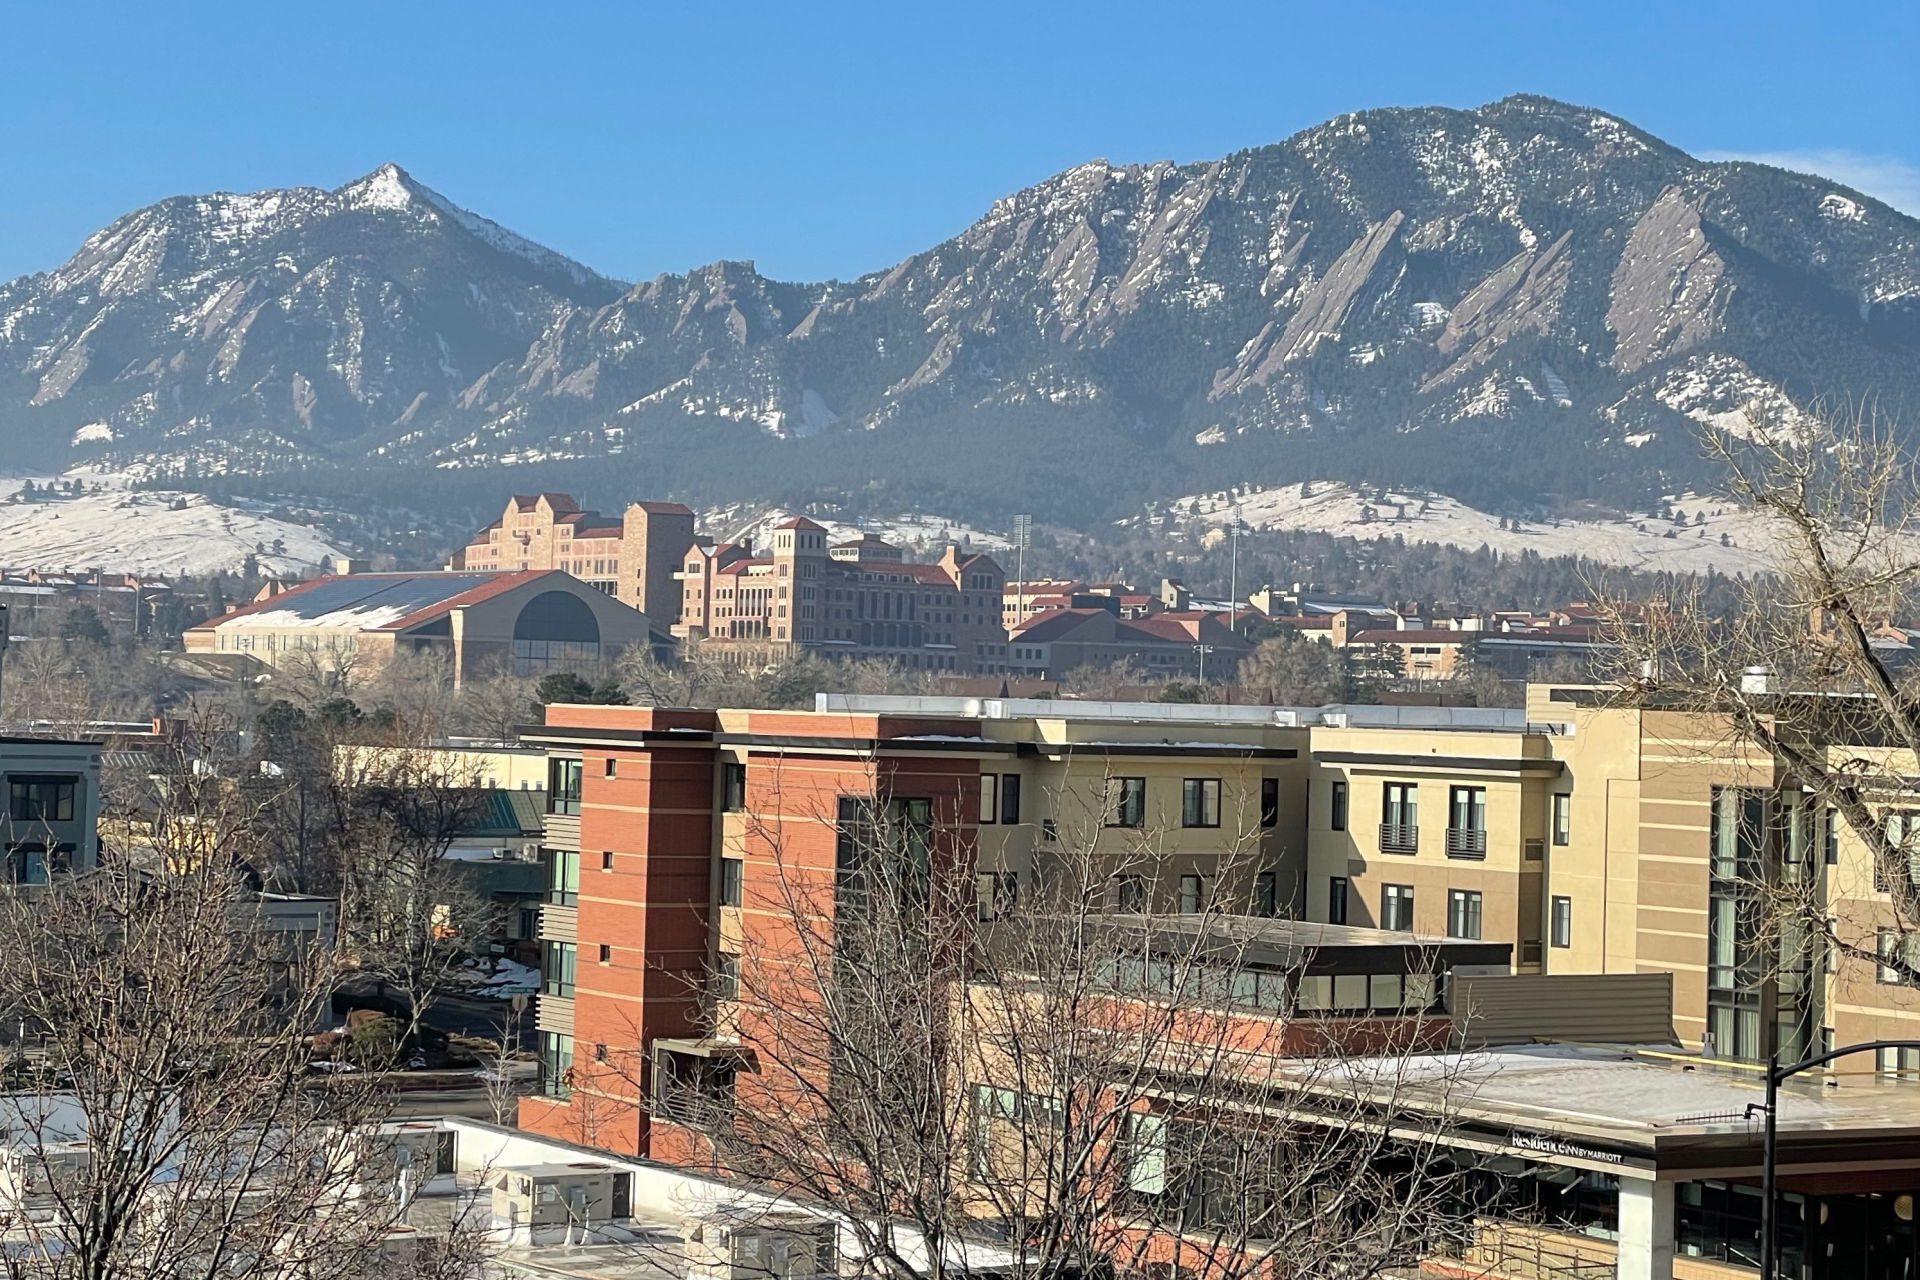 Plan your College Visit to University of Colorado Boulder